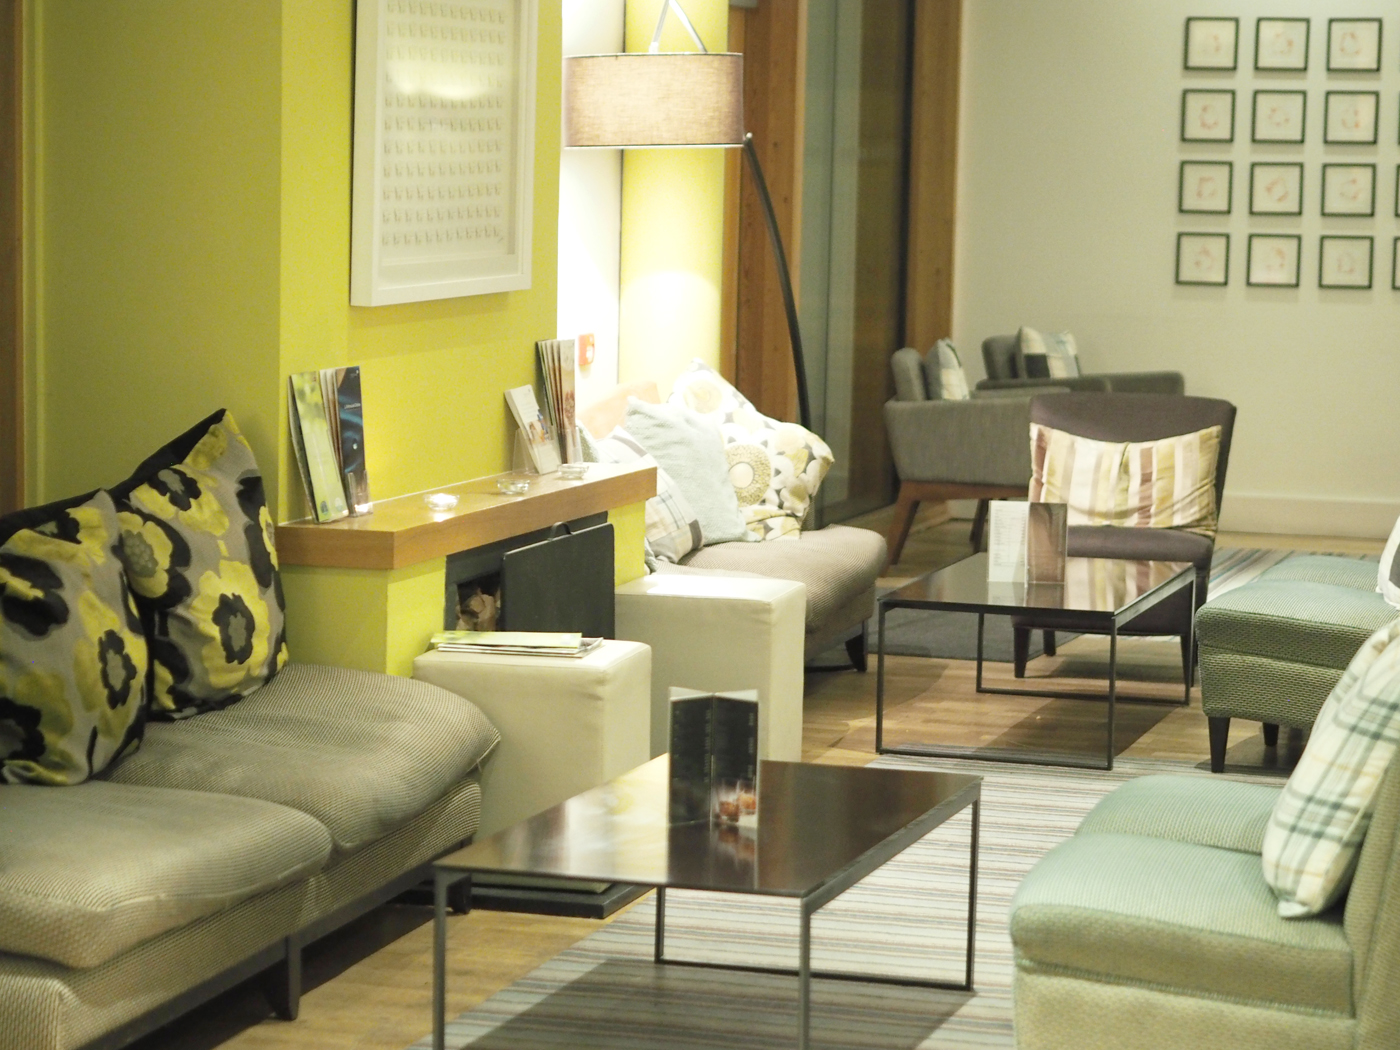 LIFEHOUSE HOTEL RESTAURANT BAR